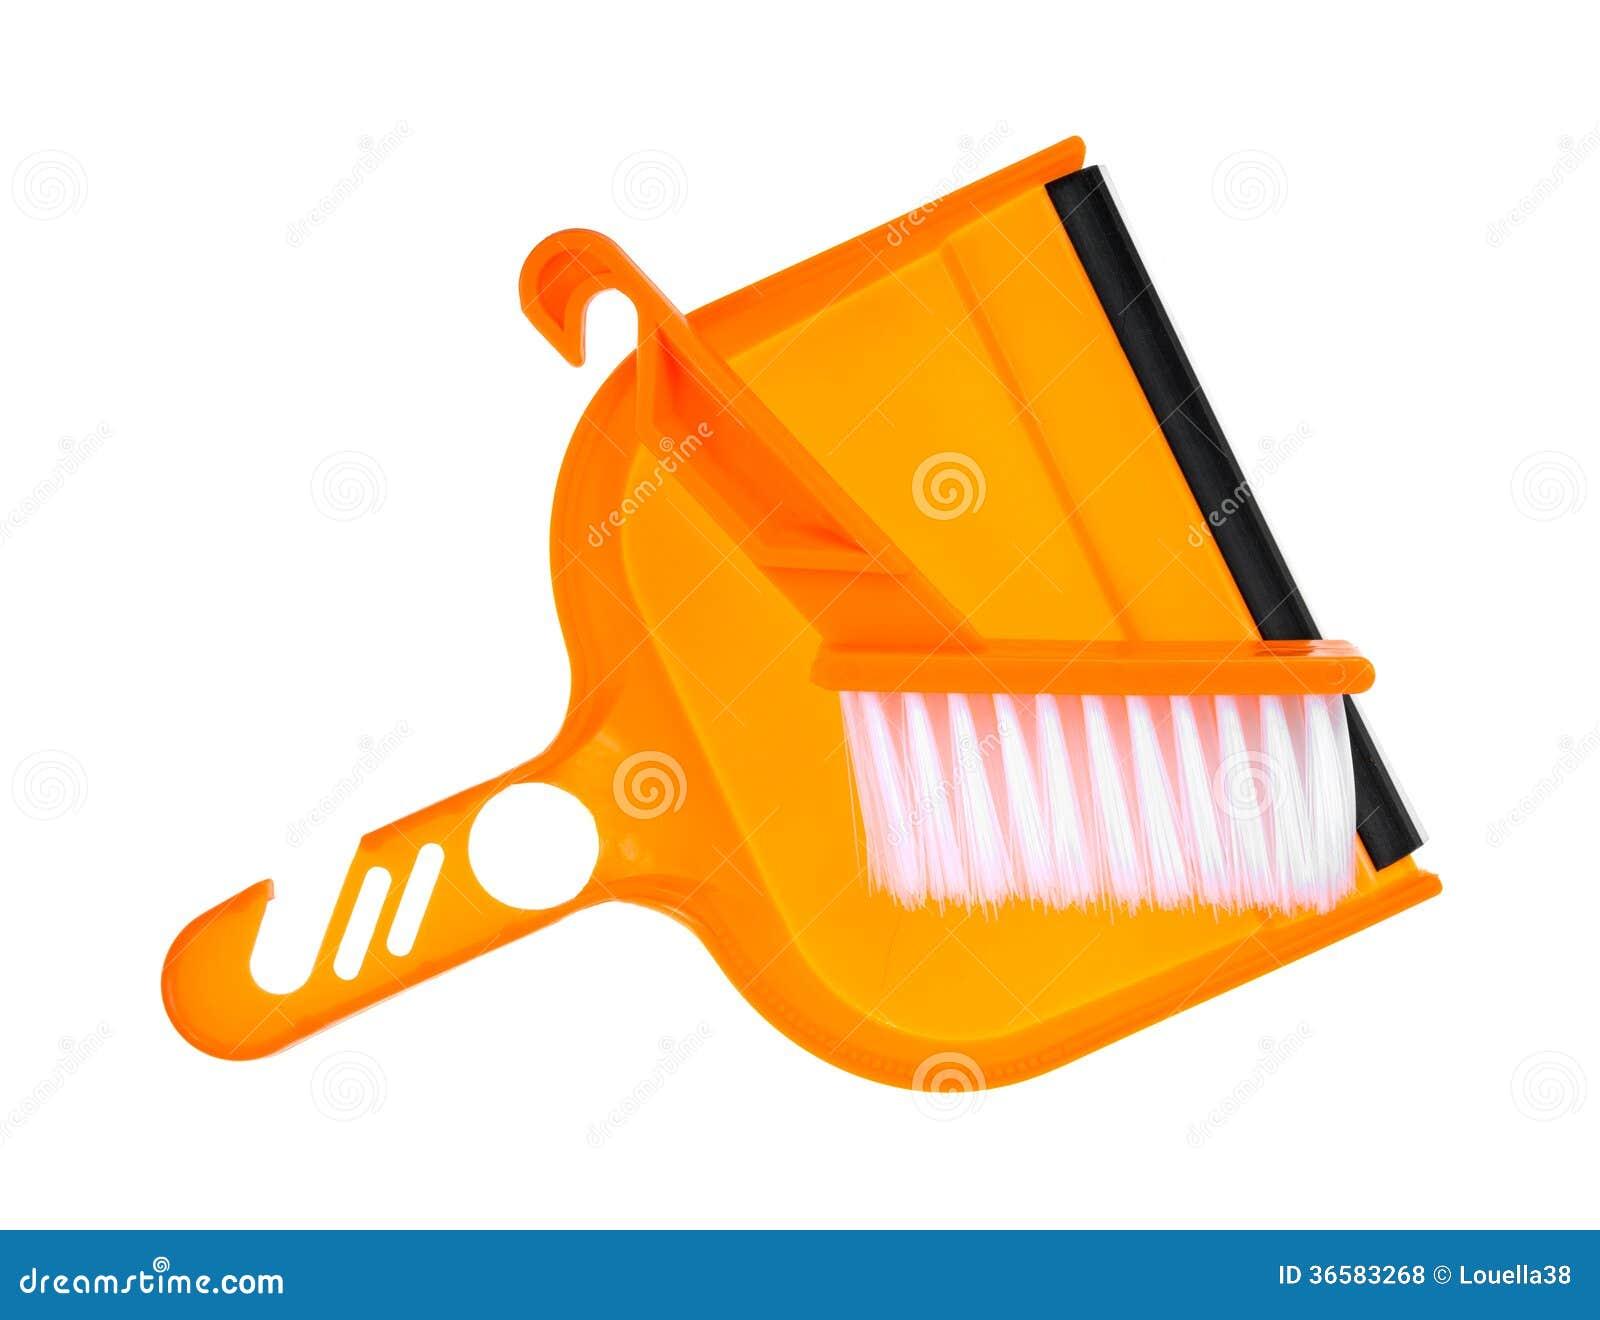 Dust Pan Brush At Angle Royalty Free Stock Photos Image